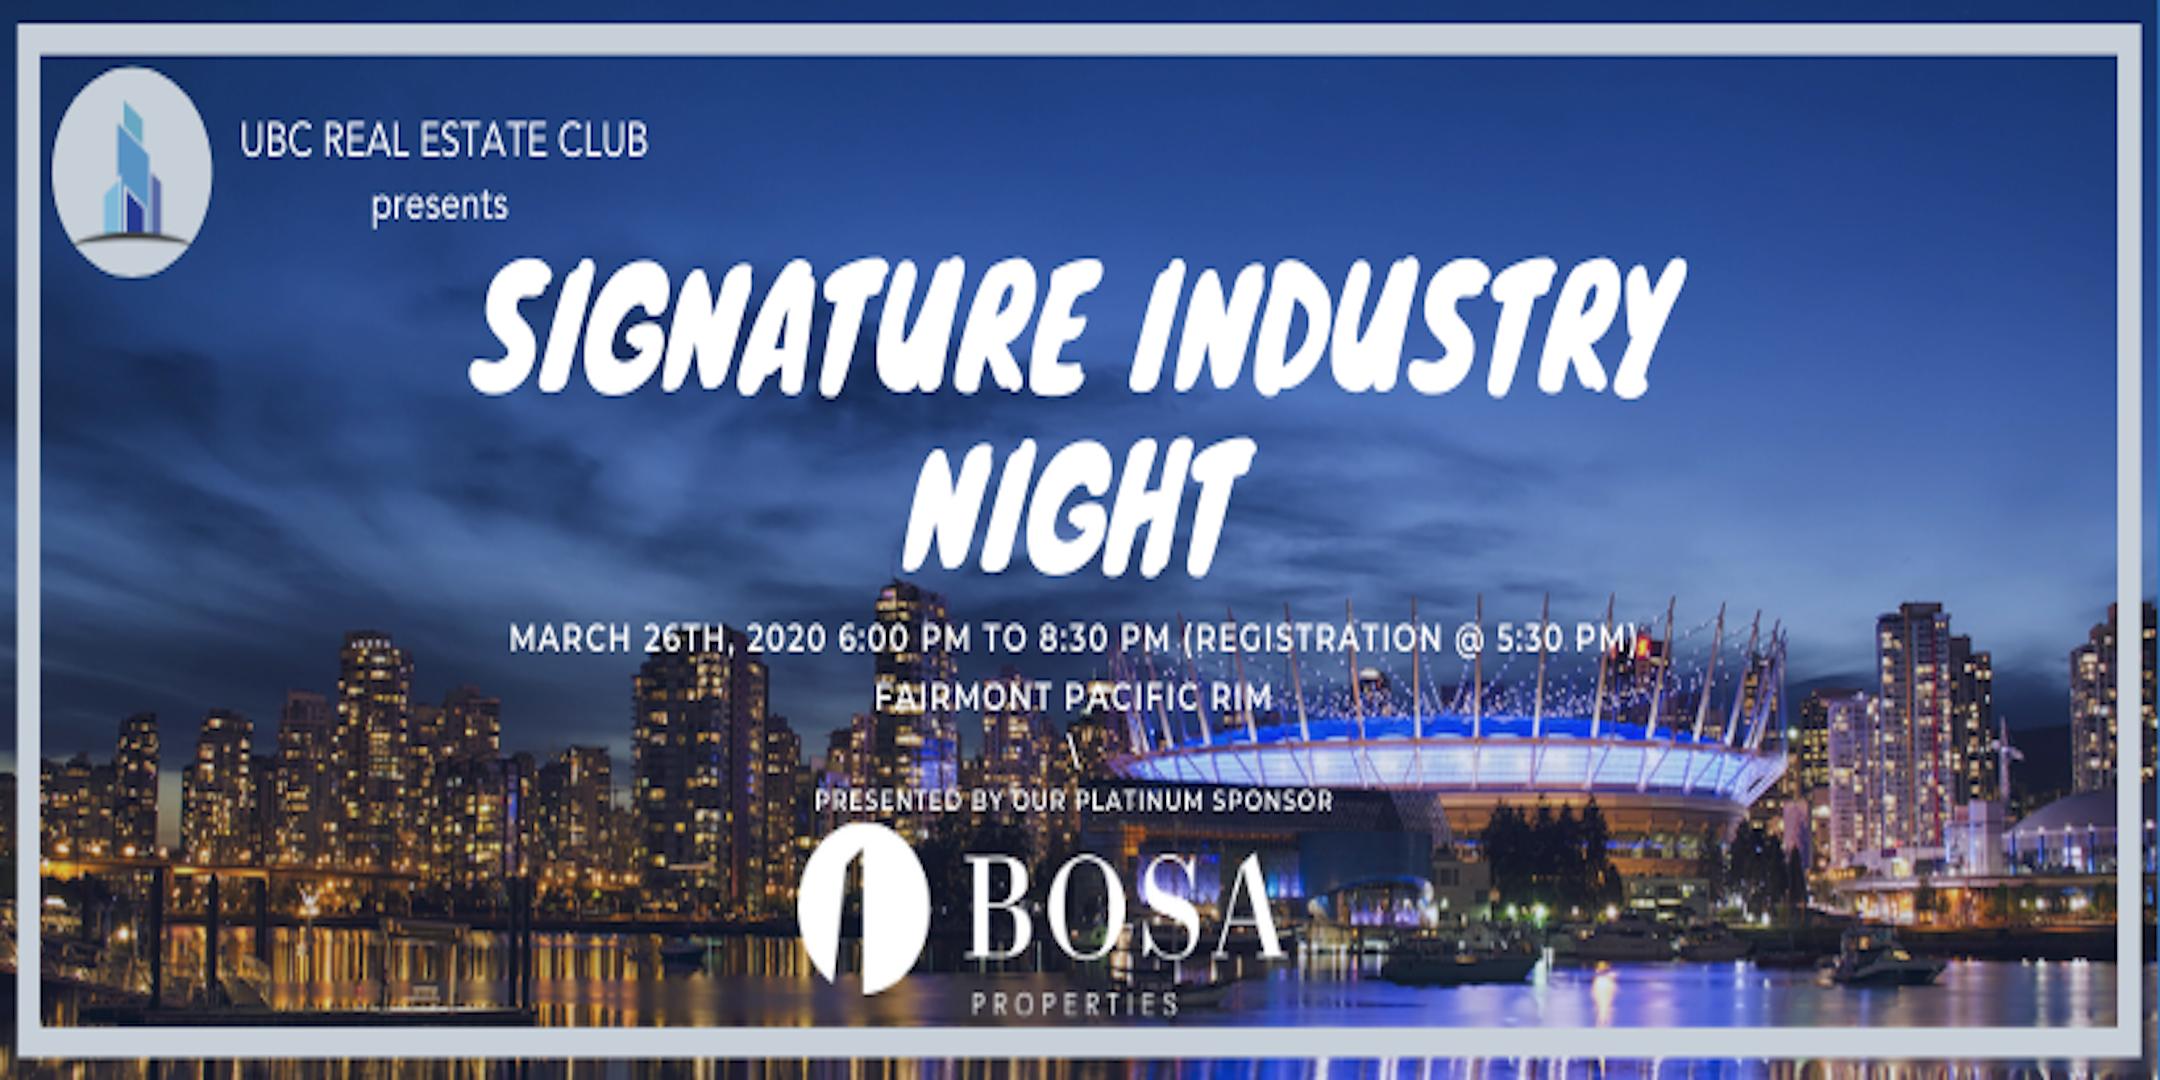 UBC Real Estate Club: Signature Industry Night 2020